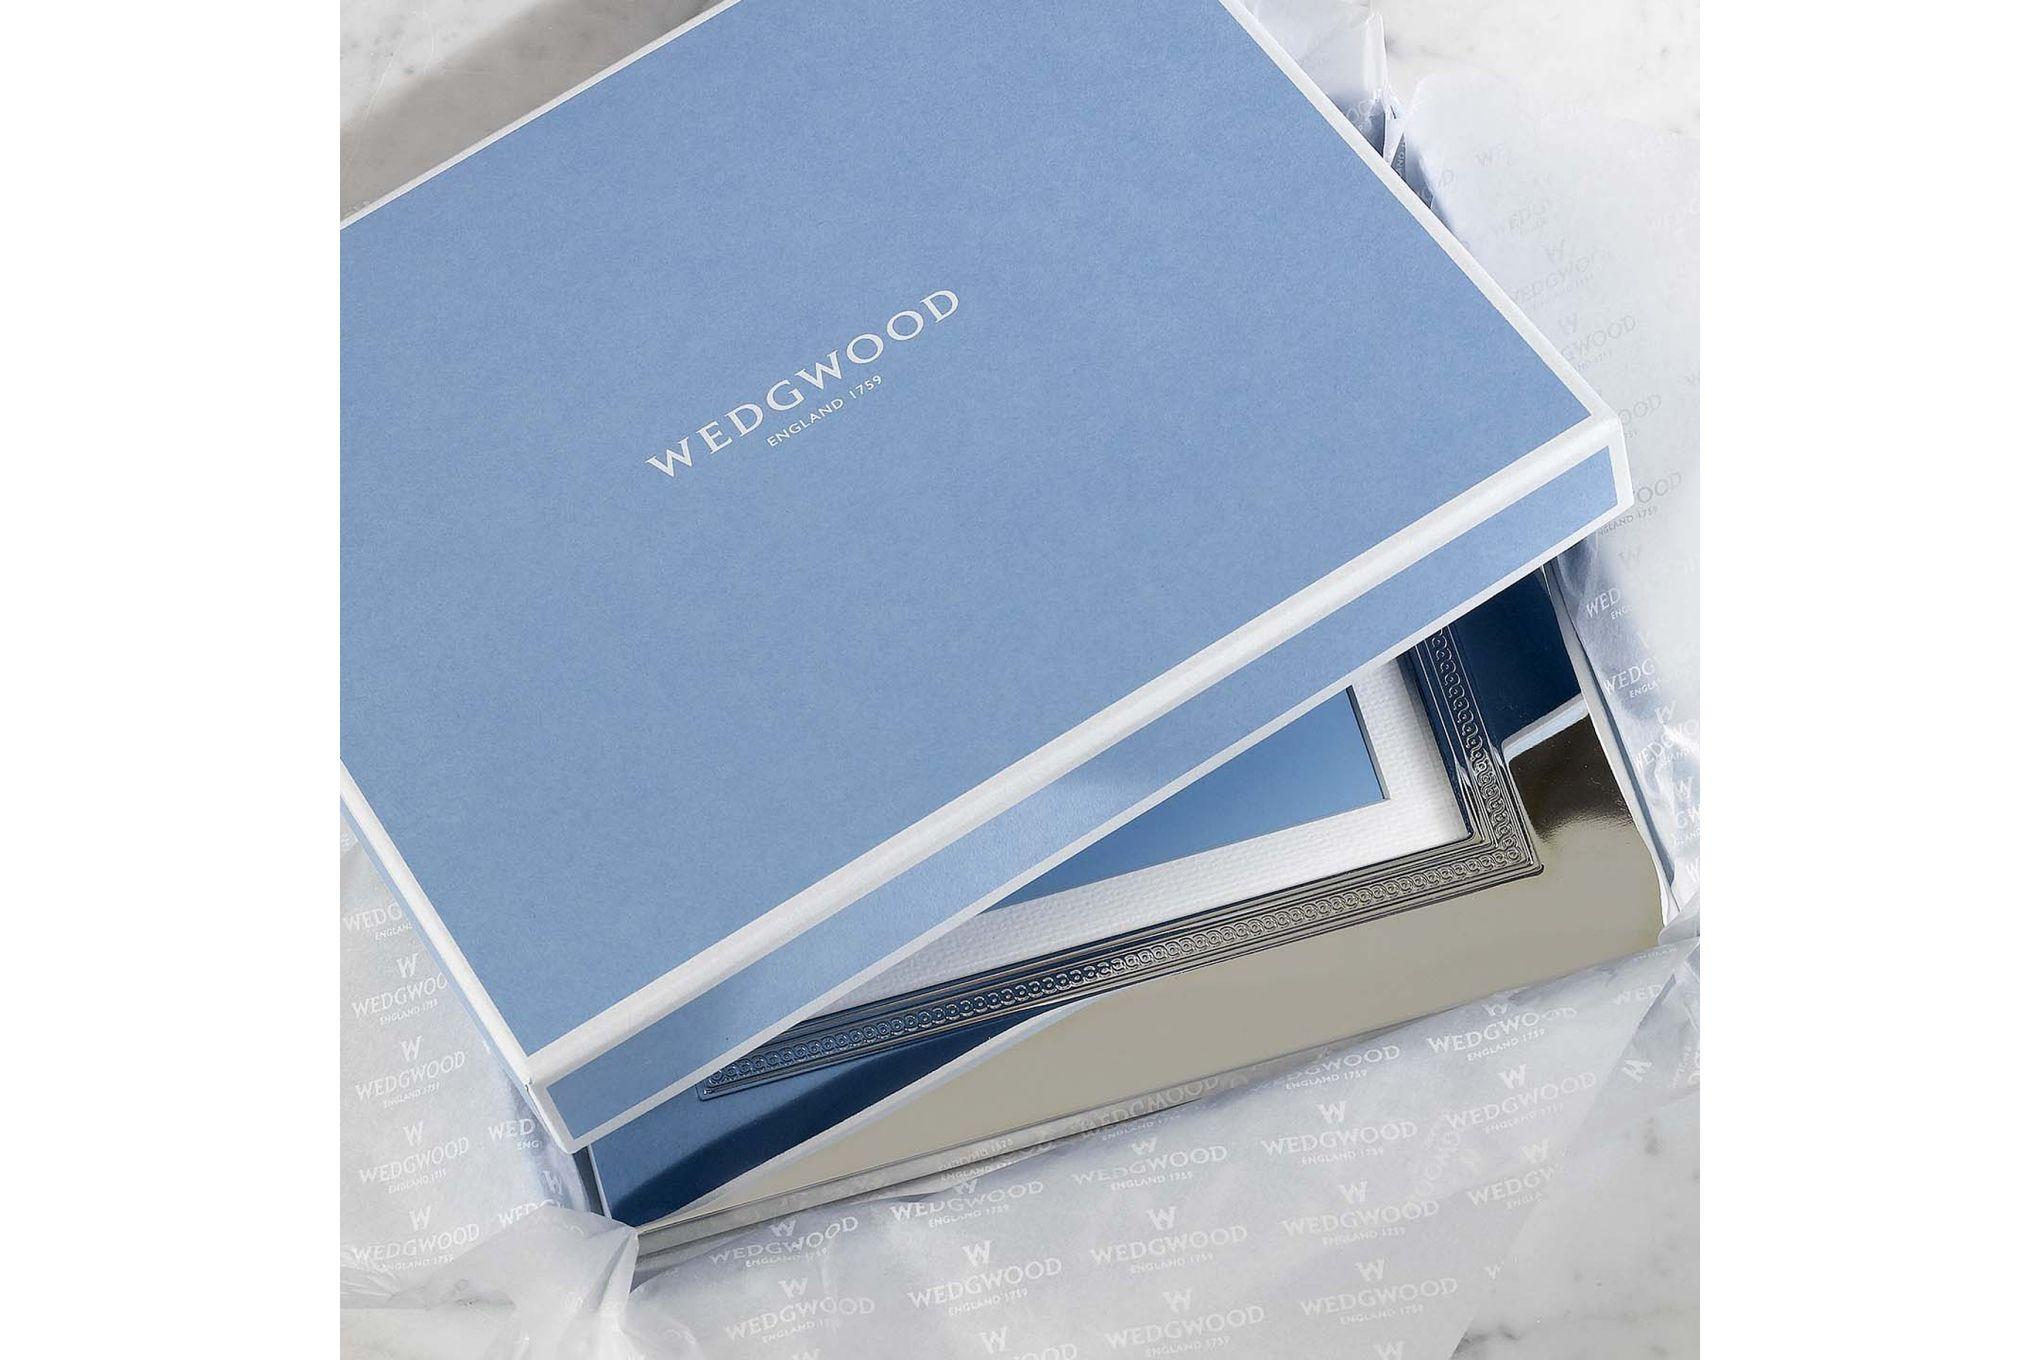 "Wedgwood Simply Wish Photo Frame 5 x 7"" thumb 2"